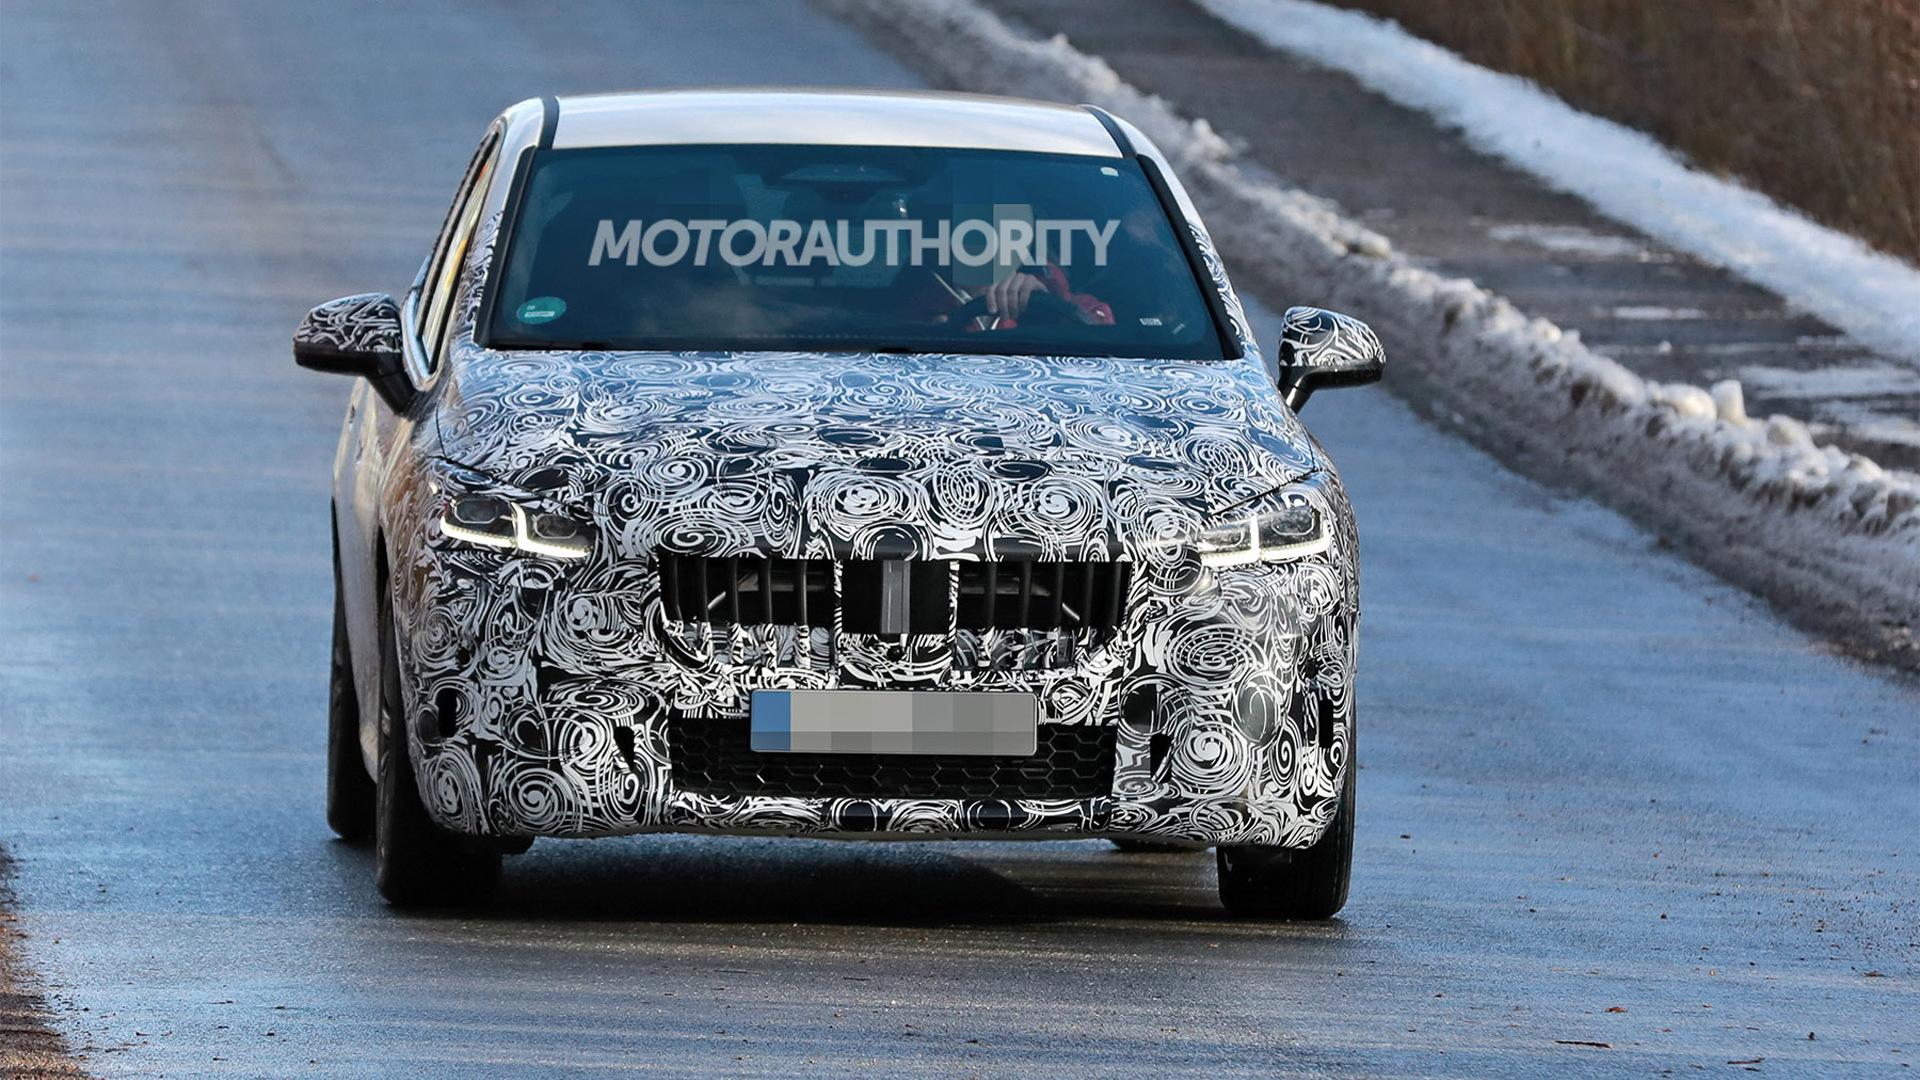 2021 BMW 2-Series Active Tourer spy shots - Photo credit:S. Baldauf/SB-Medien